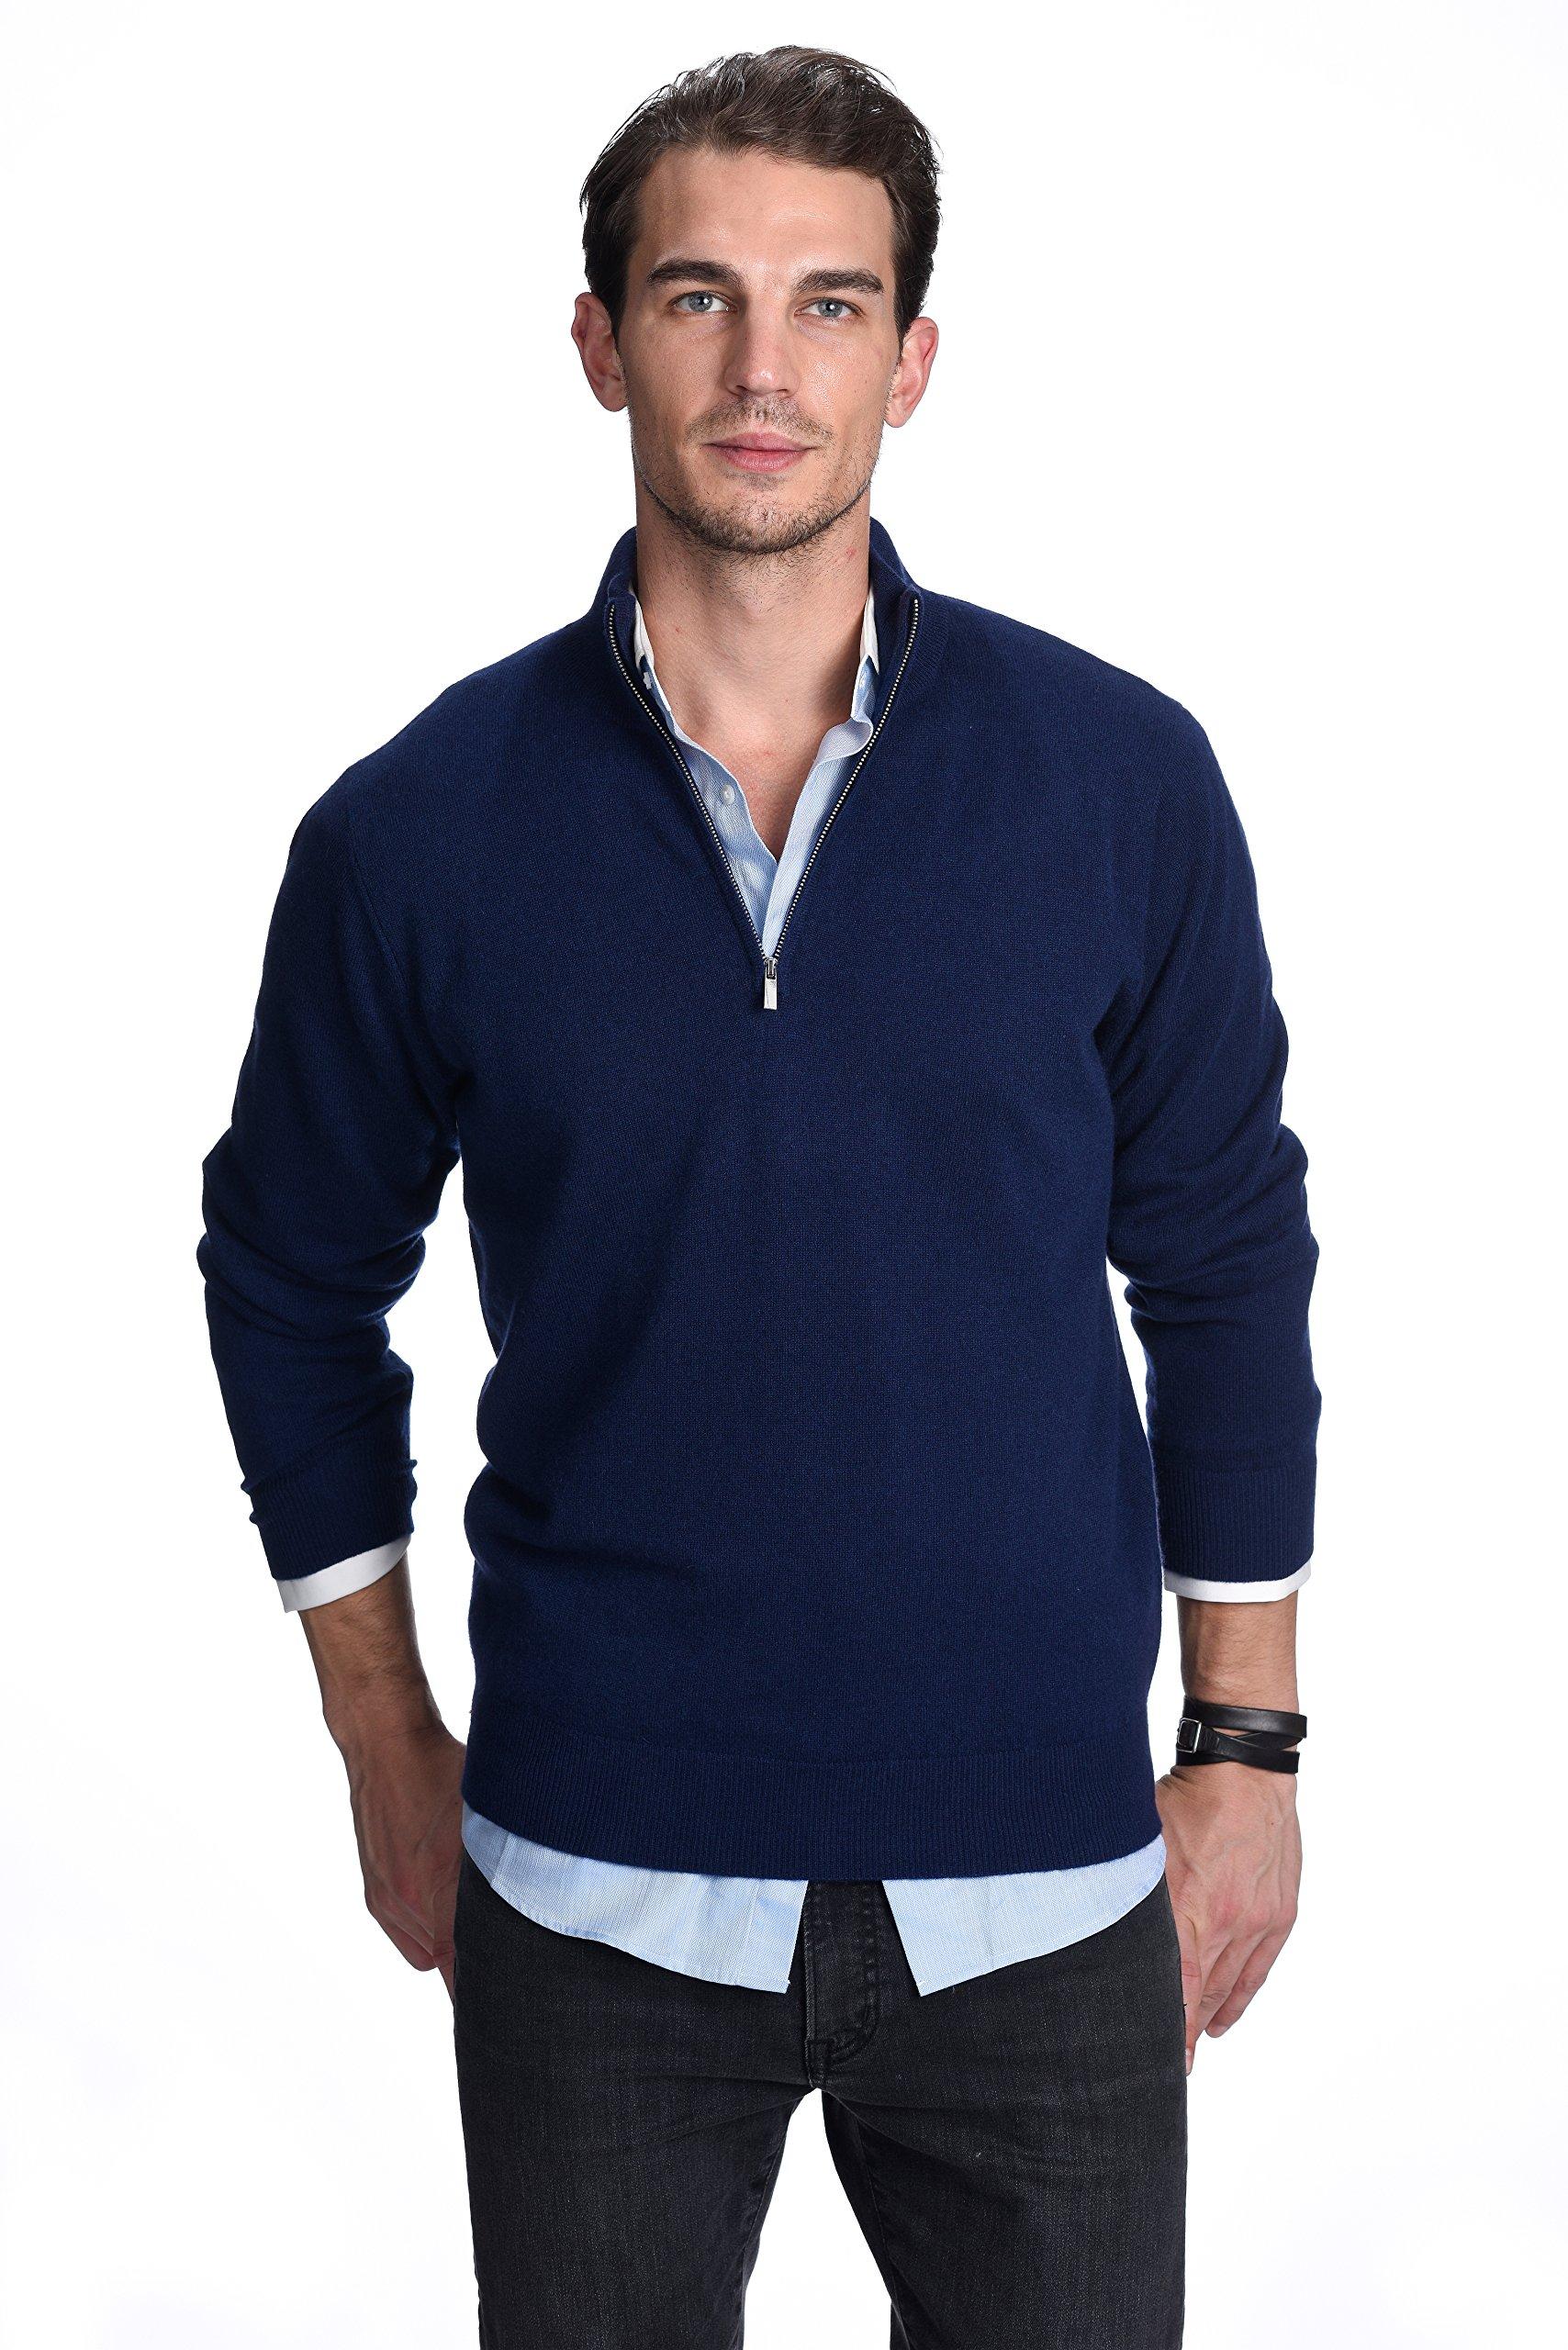 State Cashmere Men's 100% Pure Cashmere Pullover Half Zip Mock Neck Sweater (Medium, Navy Blue)